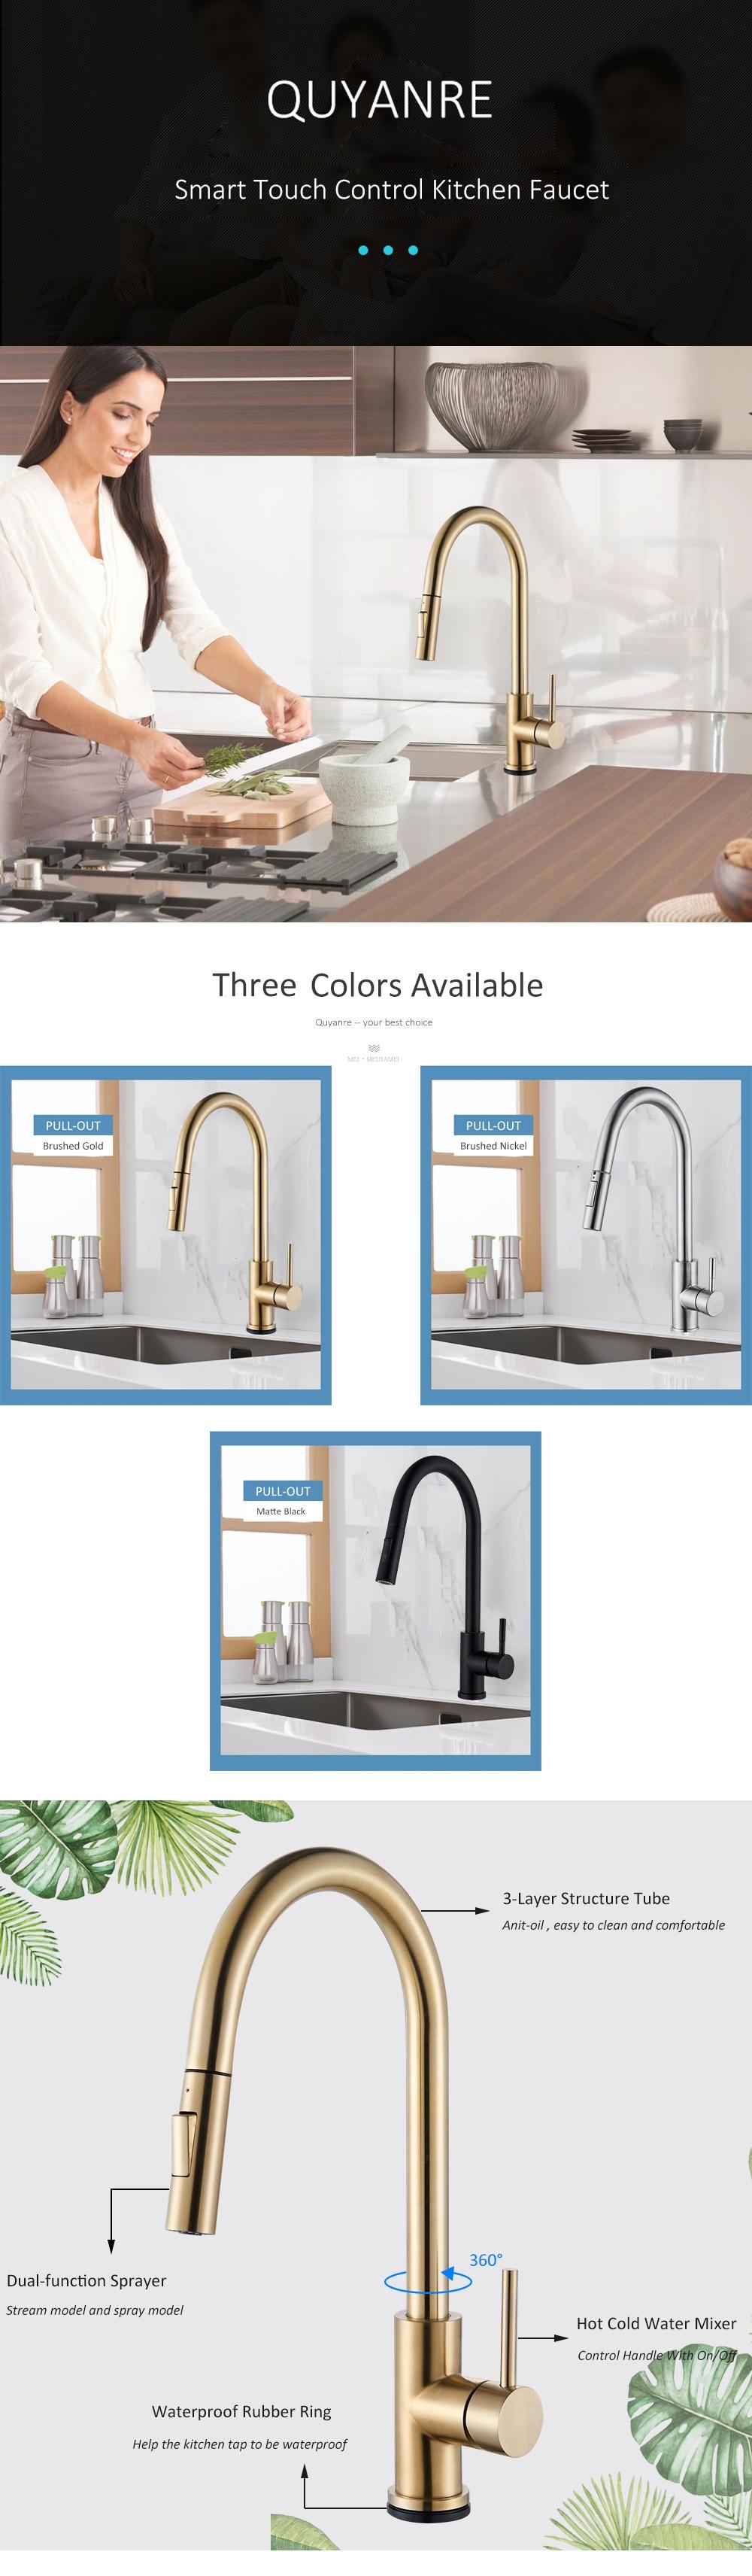 HTB1TfpkeEuF3KVjSZK9q6zVtXXa2 Champagne Bronze Gold Sensor Kitchen Faucets Sensitive Smart Touch Control Faucet Mixer Tap Touch Sensor Smart Kitchen Taps